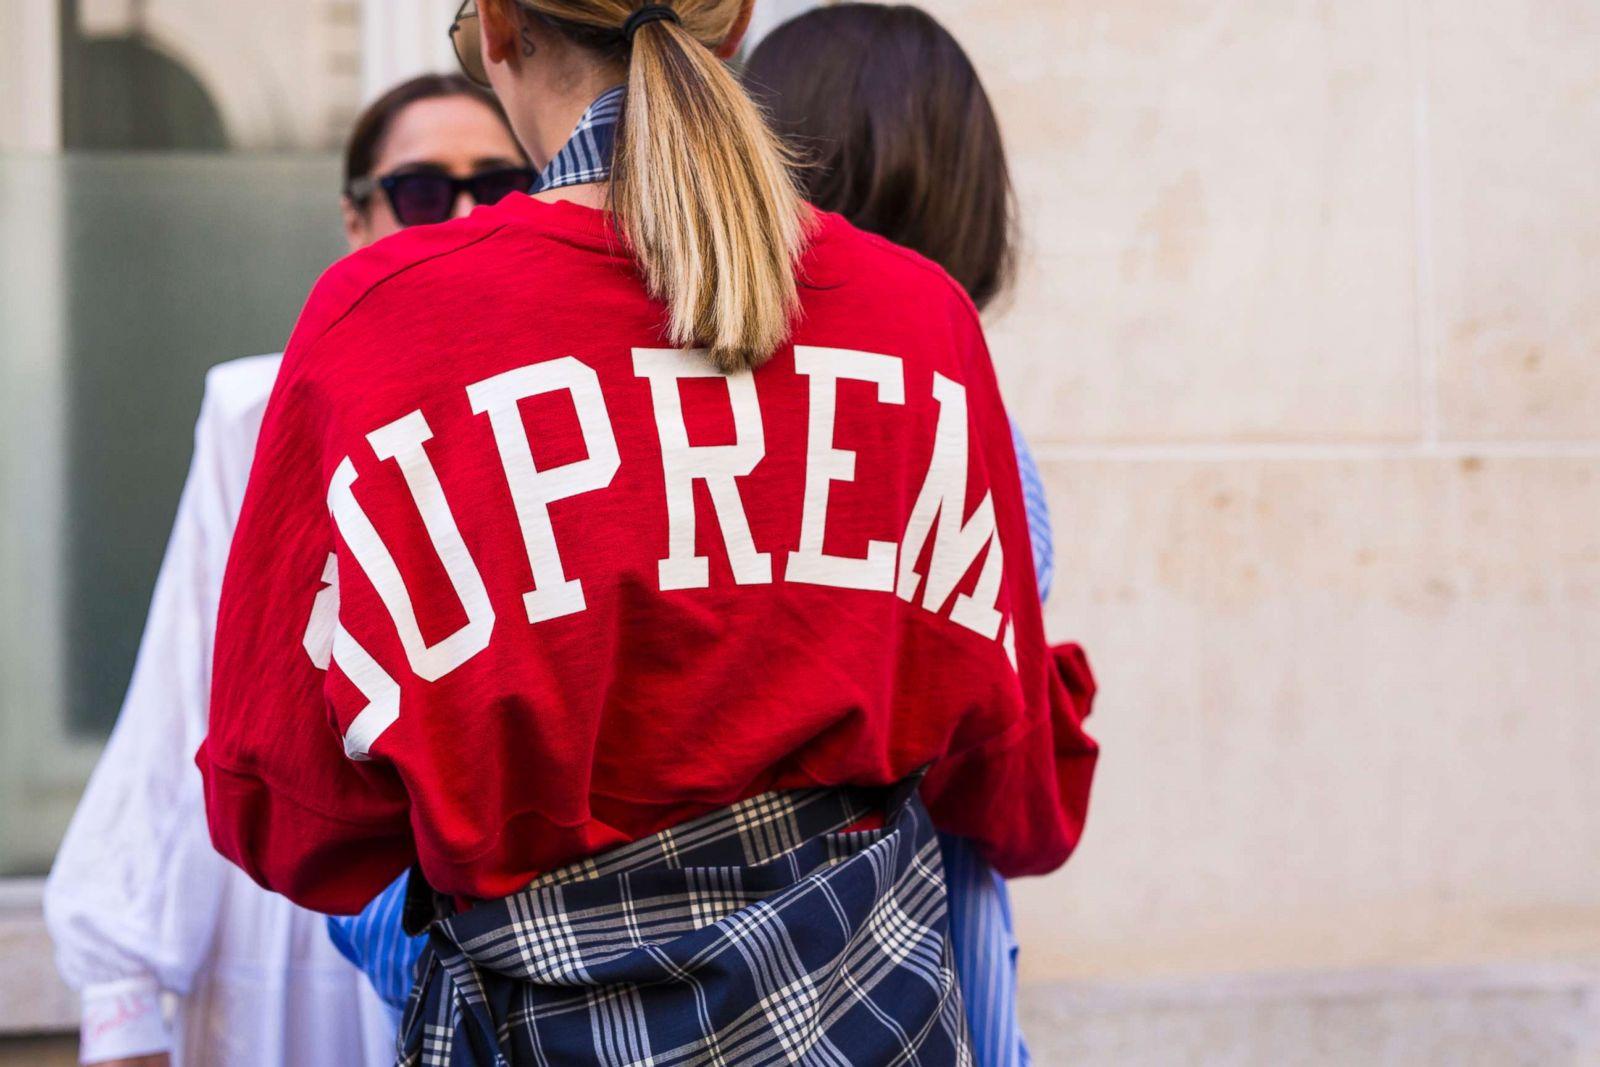 8561a18de346 Inside the Supreme Economy: Streetwear, phones, bots and side hustles - ABC  News